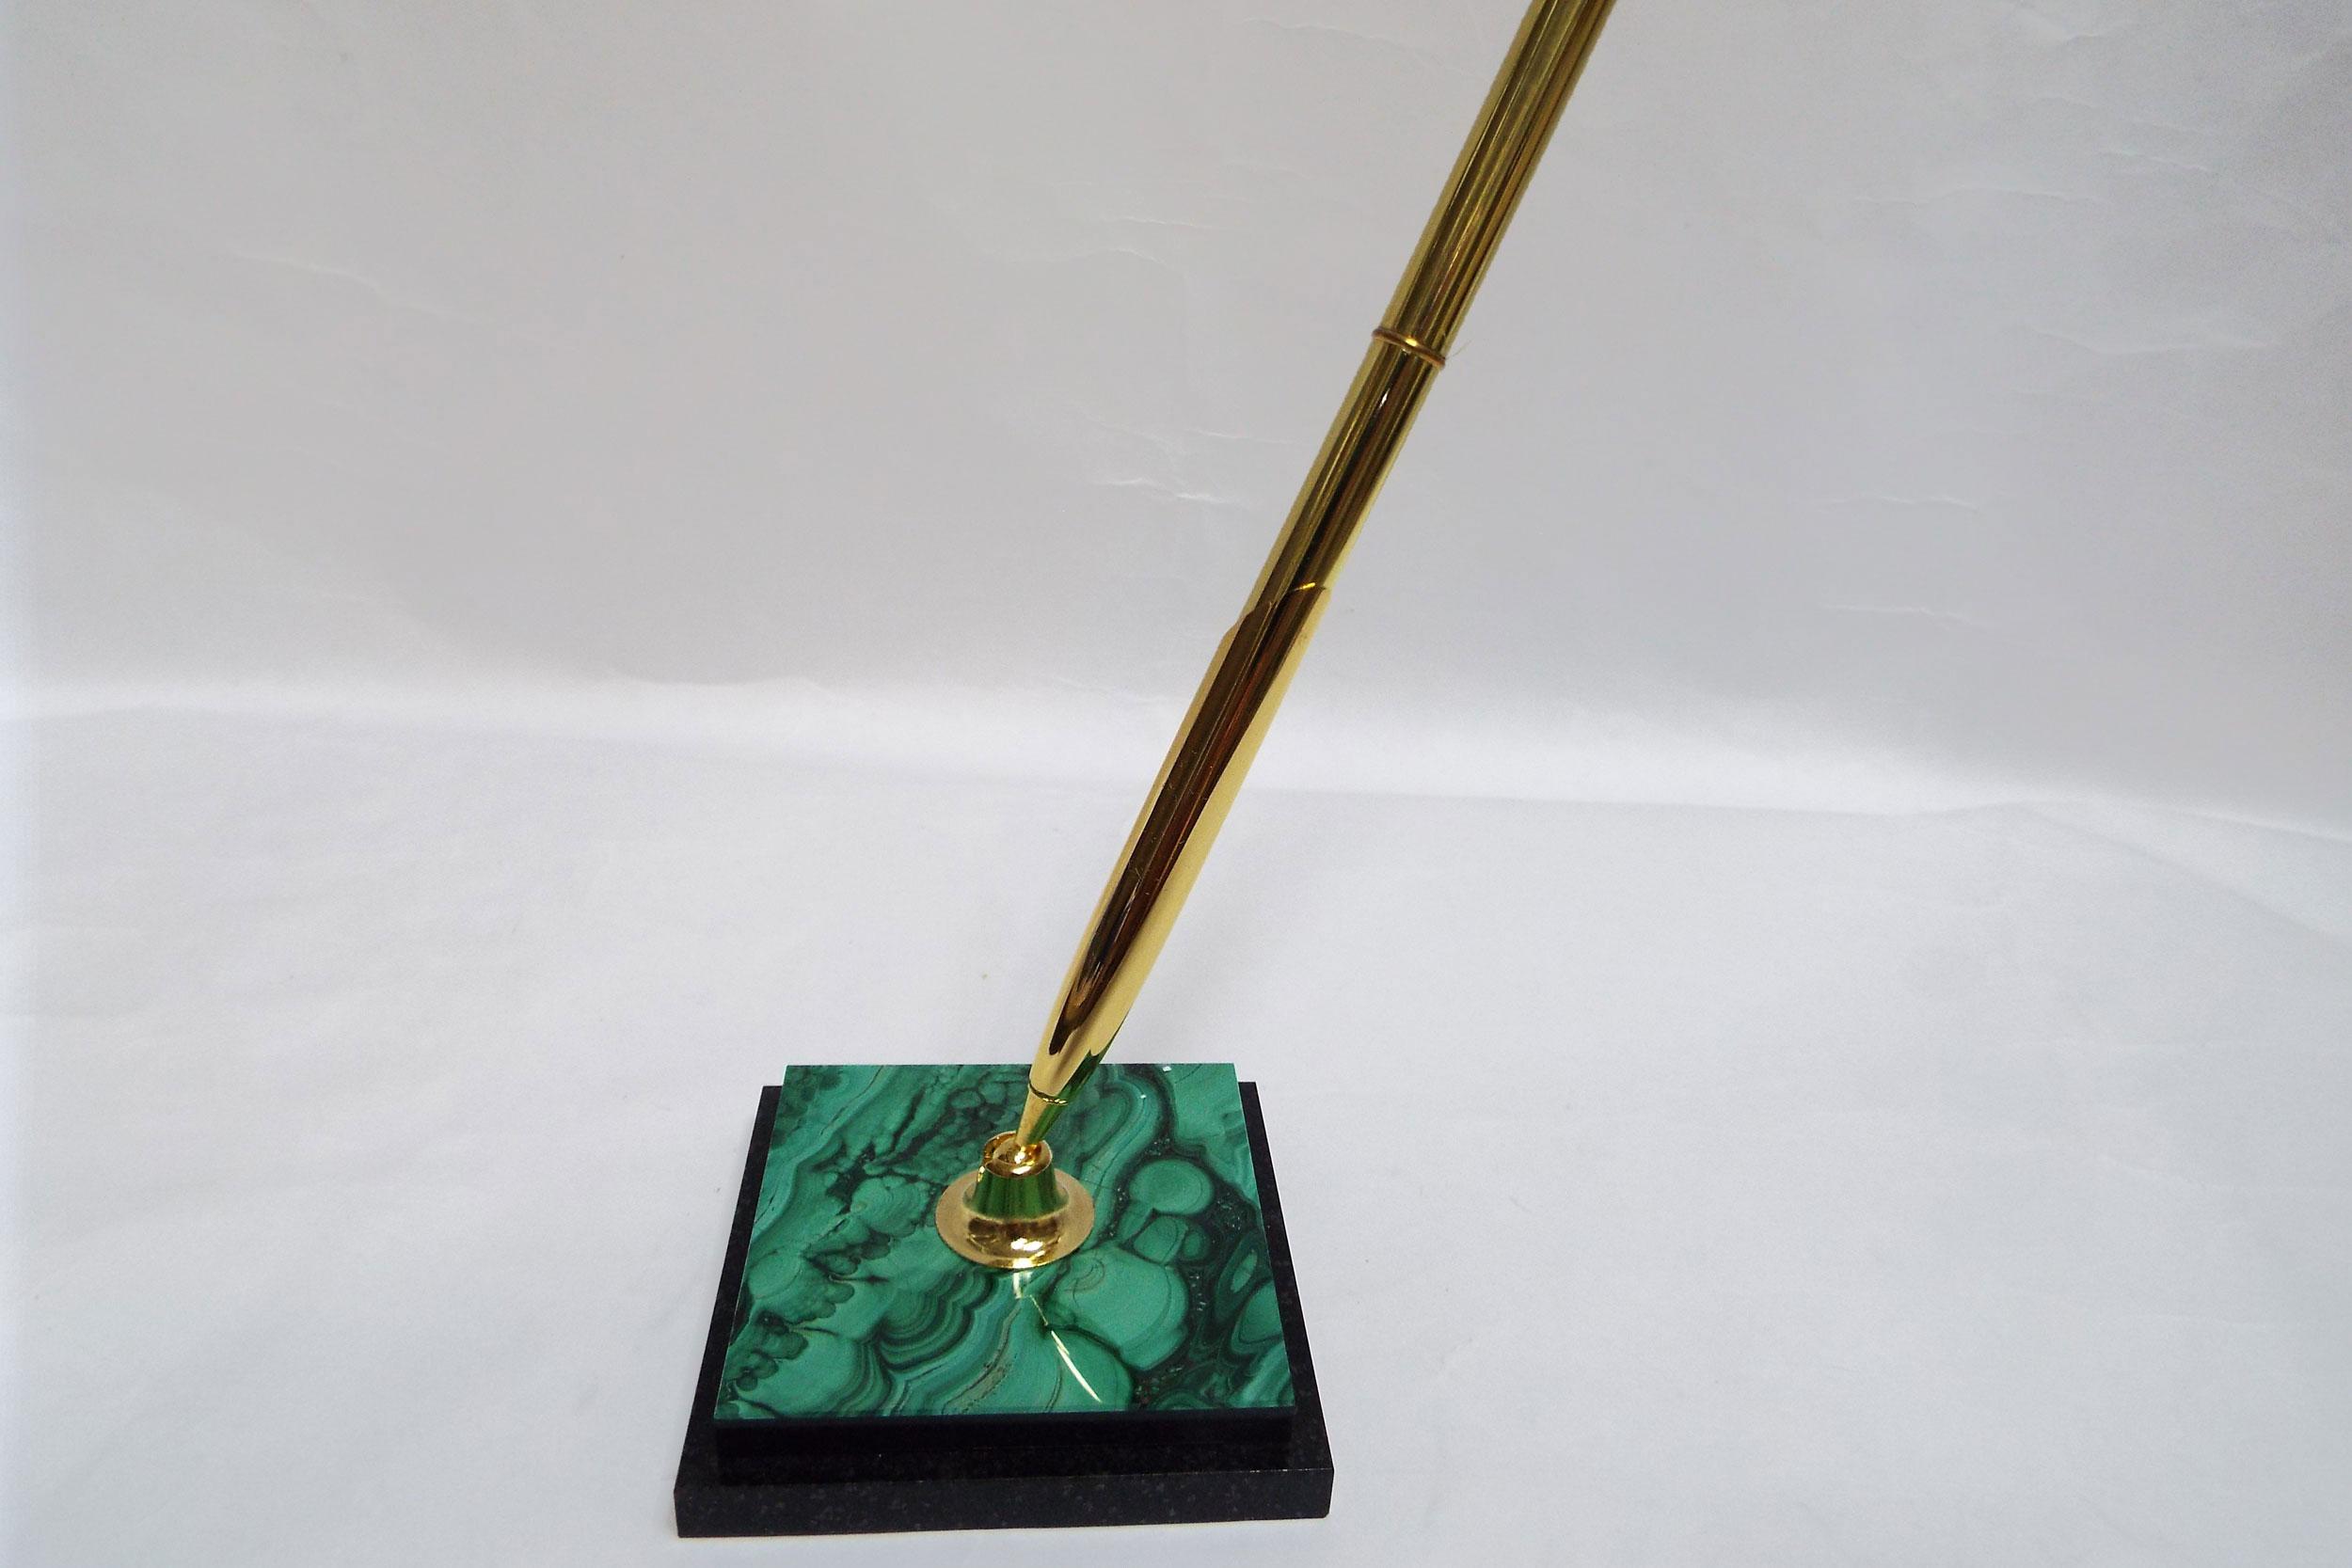 Ручка на подставке из малахита